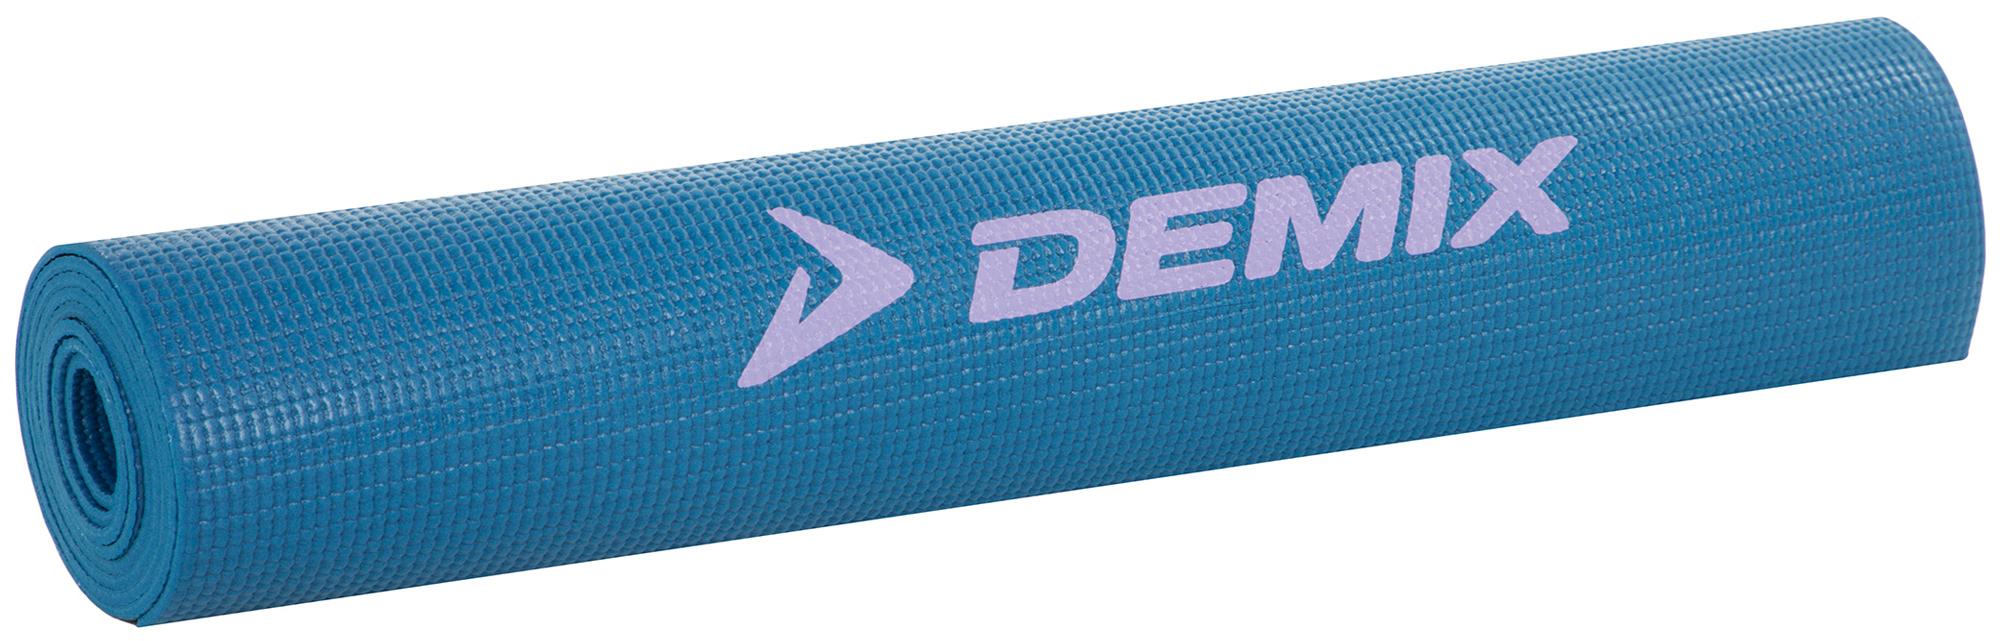 Фото - Demix Коврик для йоги Demix demix коврик для йоги demix